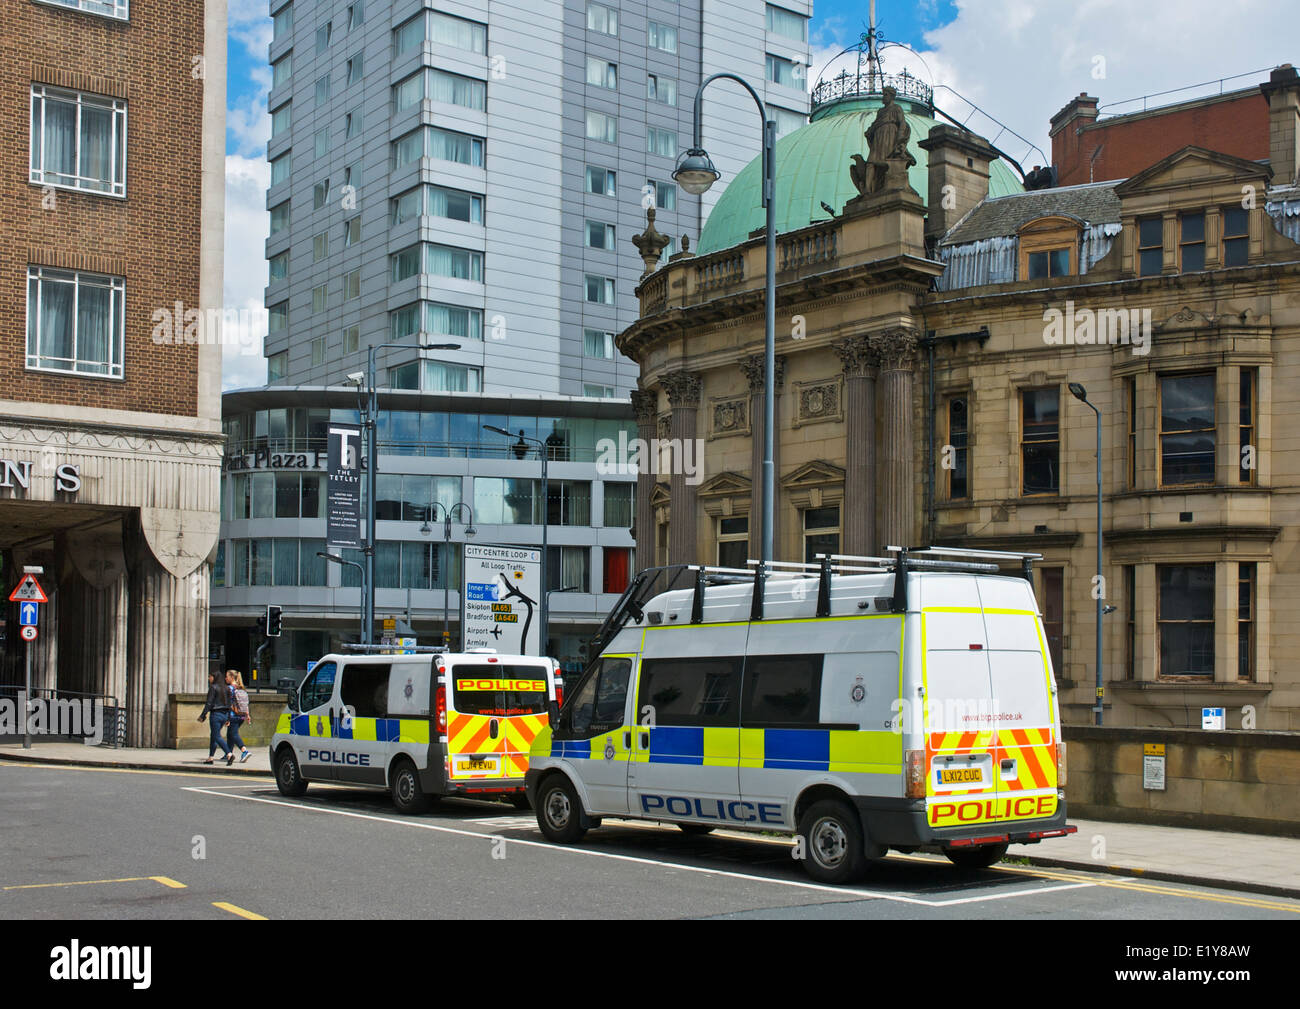 Police vans parked at Leeds City railway station, West Yorkshire, England UK - Stock Image